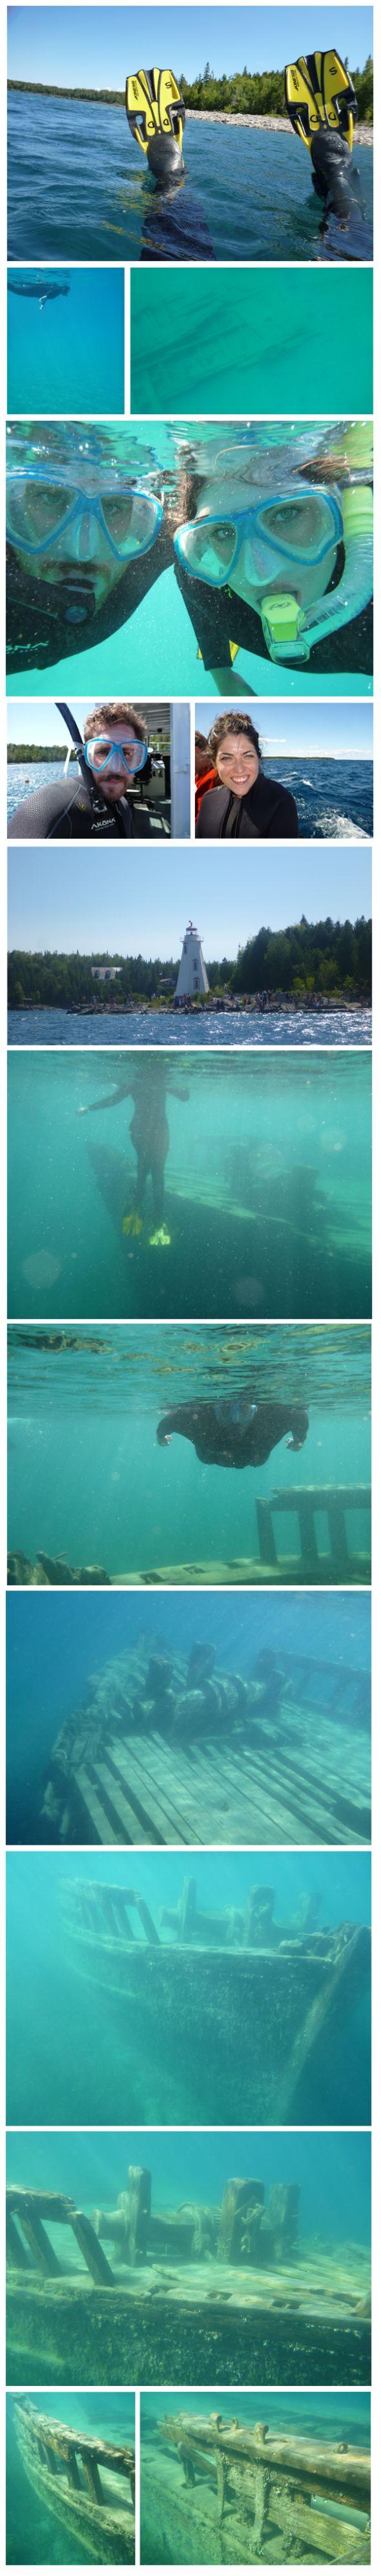 #74 - Go snorkeling.  #100Thingsin2013